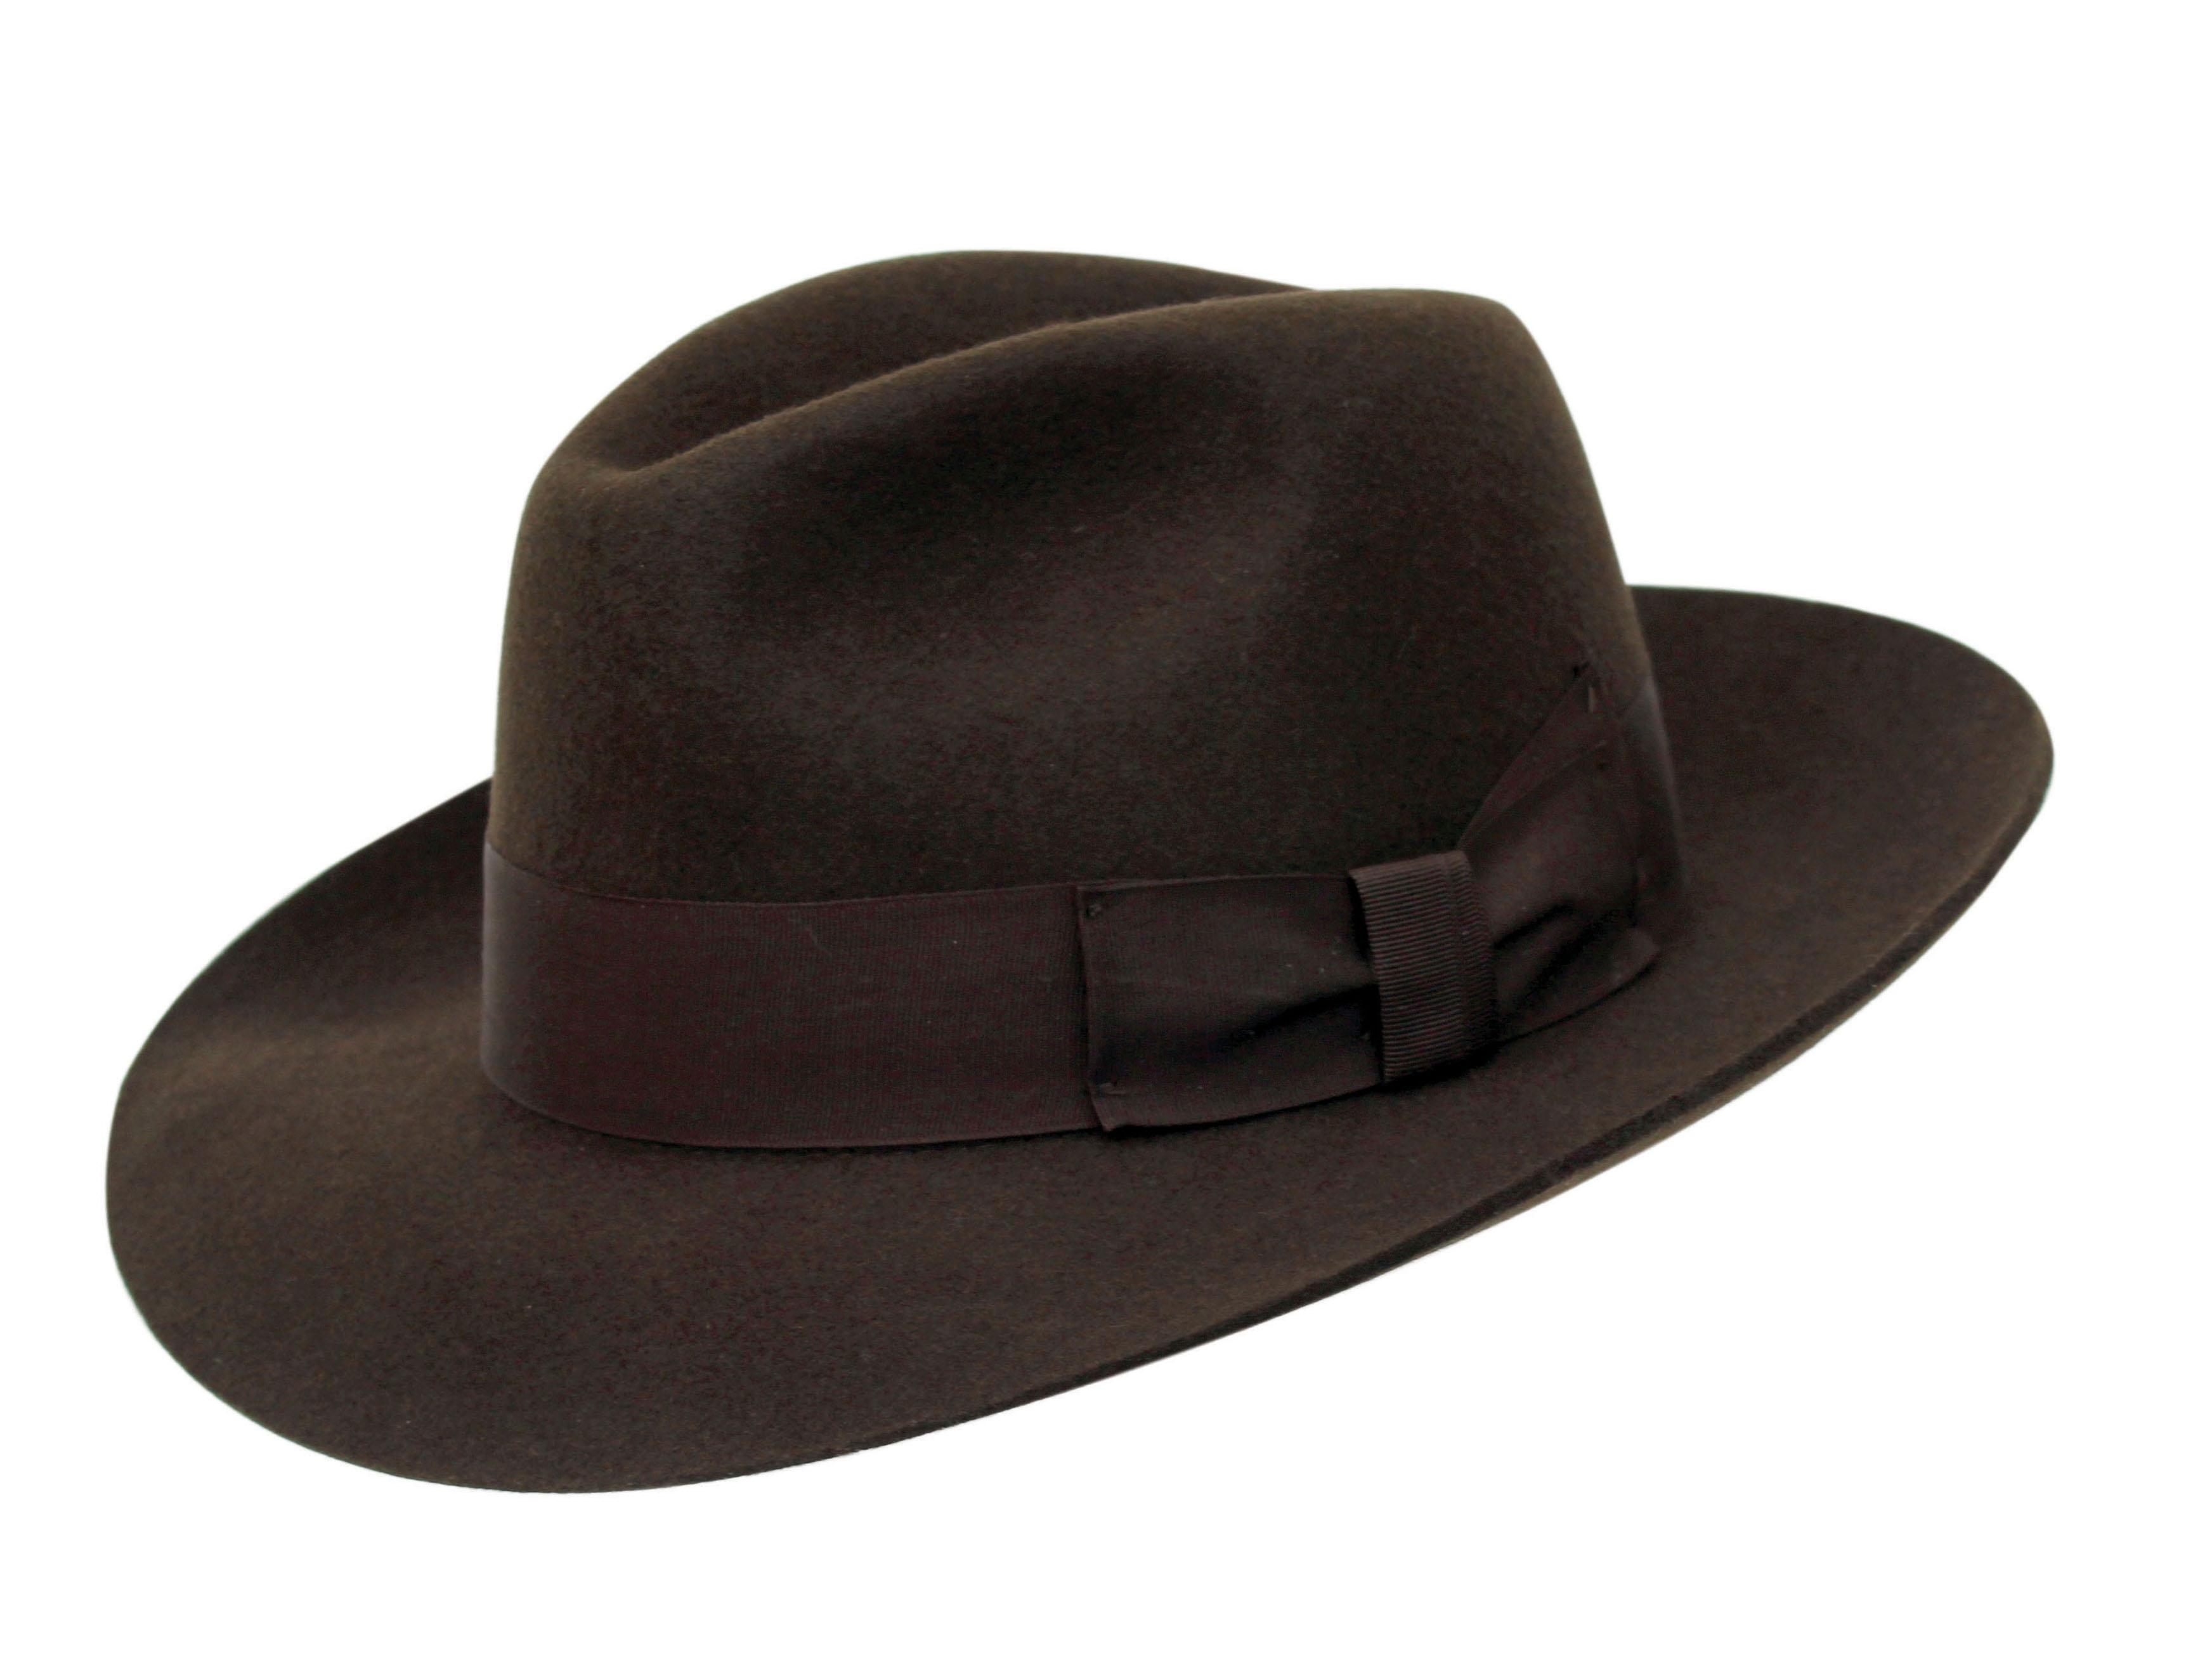 Wool Felt Trilby s   Fedoras Archives - Denton Hats f0c8912a3427